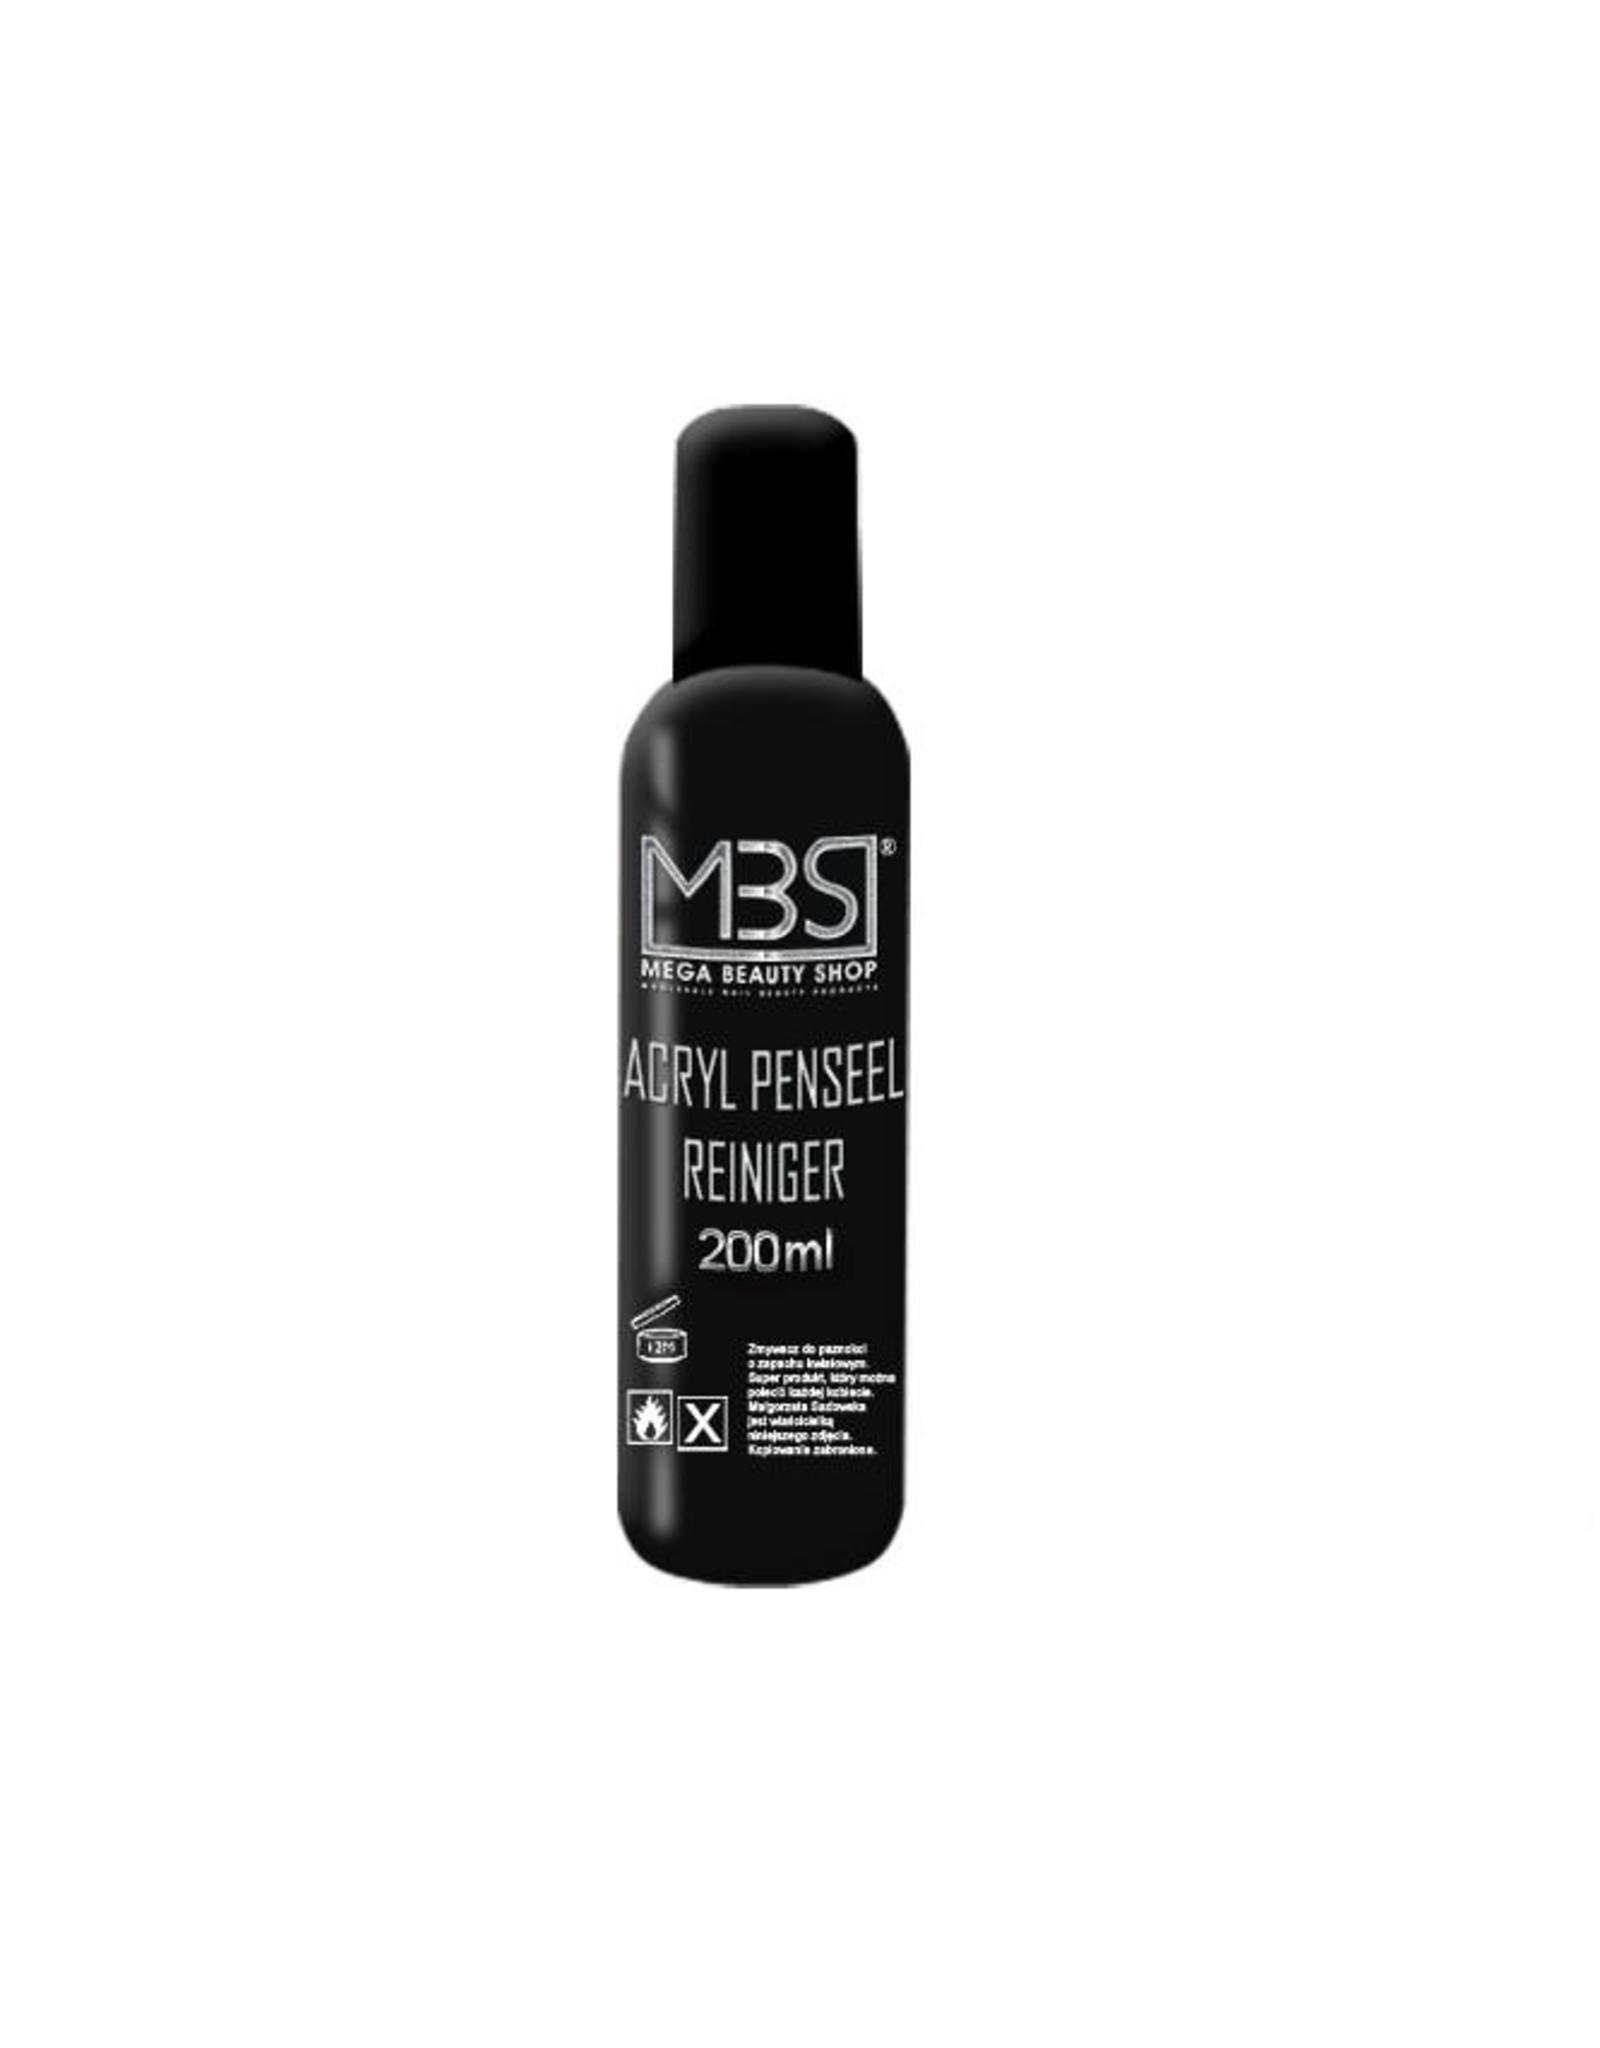 Mega Beauty Shop® Acryl penseelreiniger (200 ml)    met amandelgeur